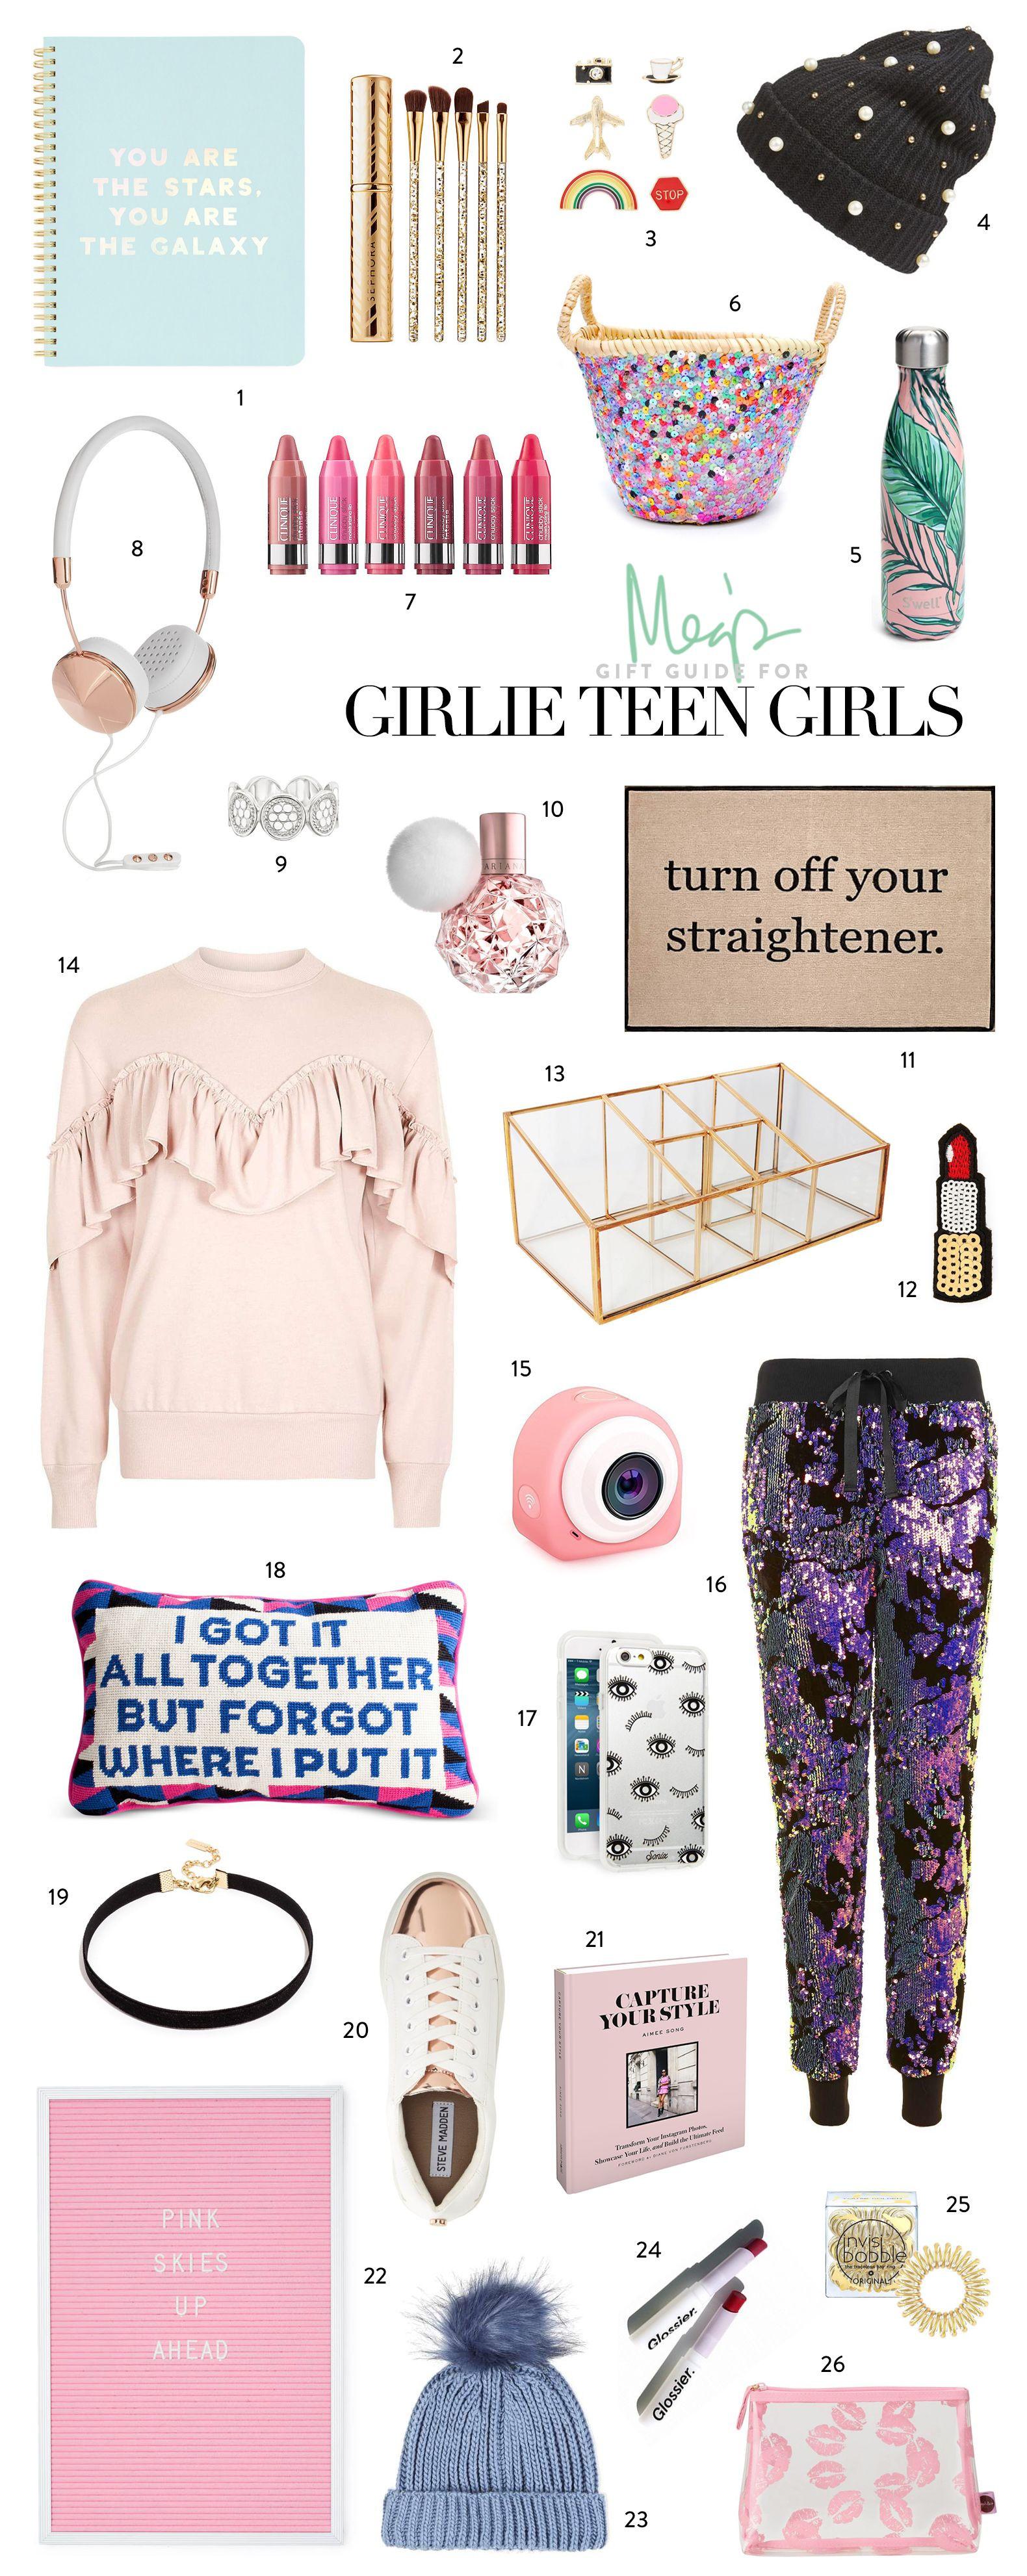 Teenage Girlfriend Gift Ideas  Holiday Gift Guide Girlie Teen Girls